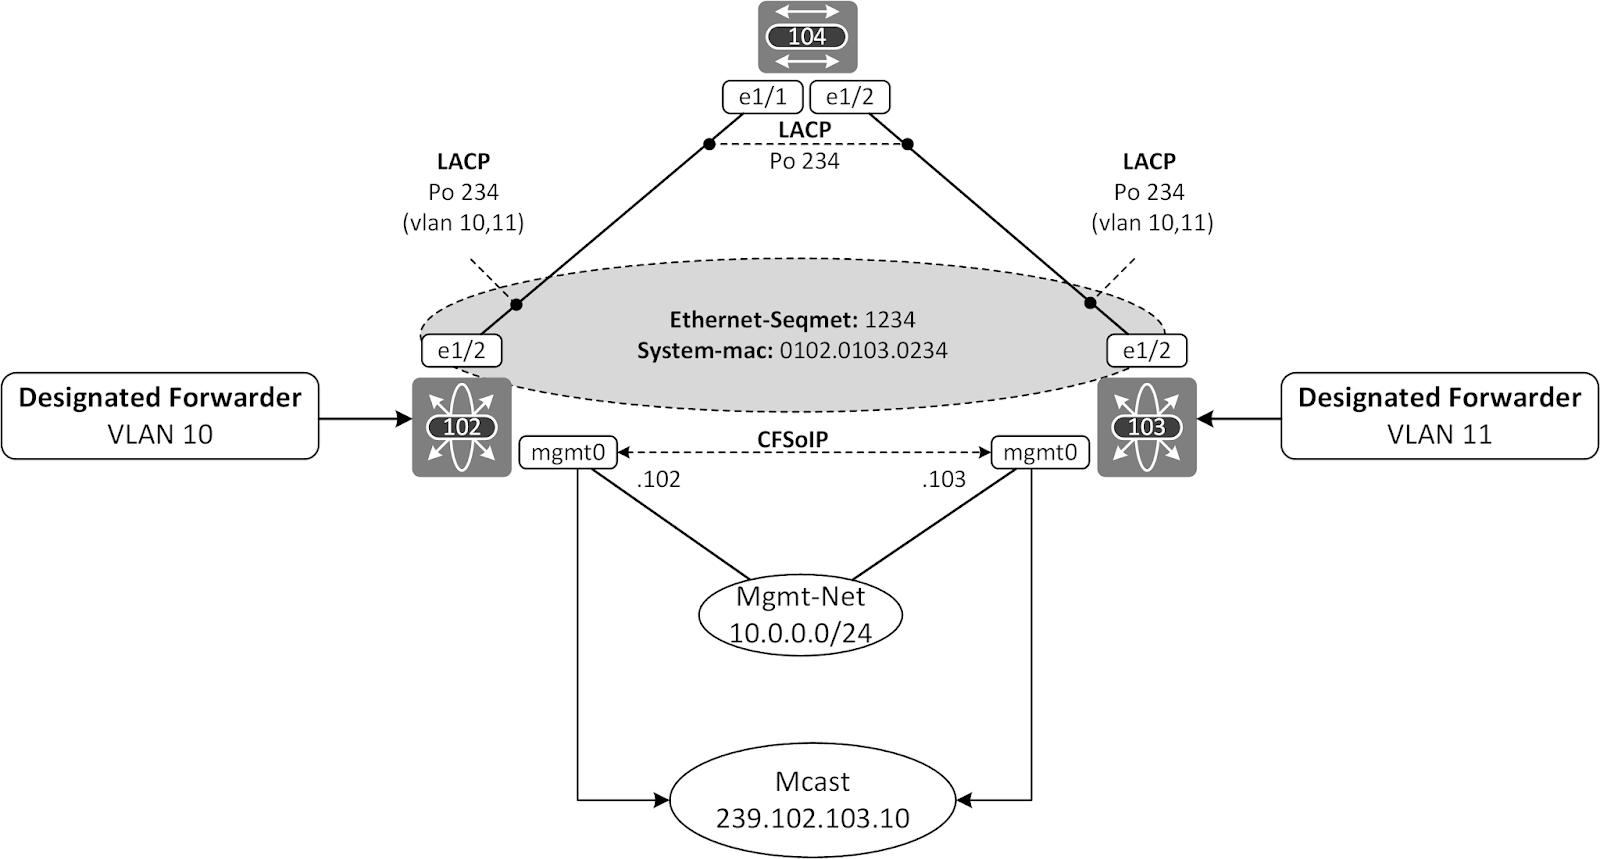 The Network Times: EVPN ESI Multihoming - Part I: EVPN